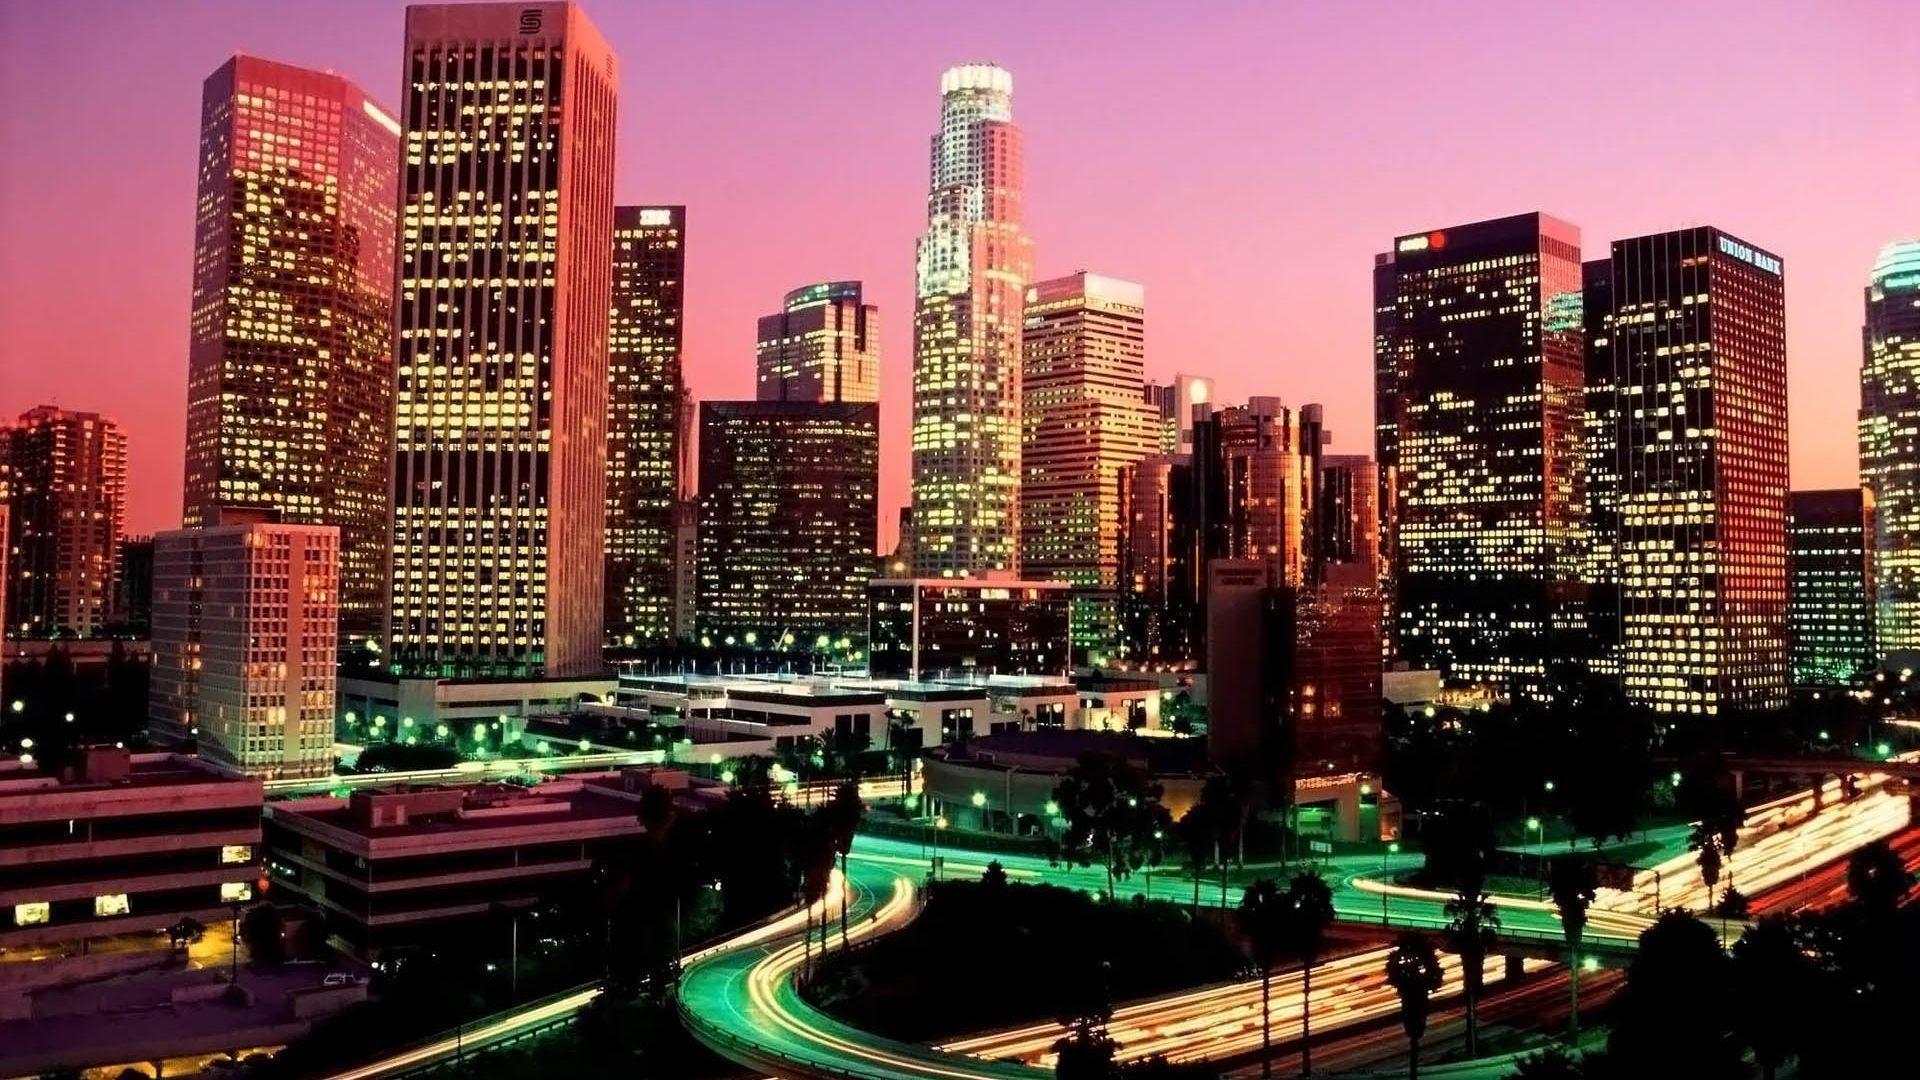 Full Hd 1080p Los Angeles Wallpapers Hd Desktop Backgrounds Los Angeles Skyline Los Angeles Wallpaper California City